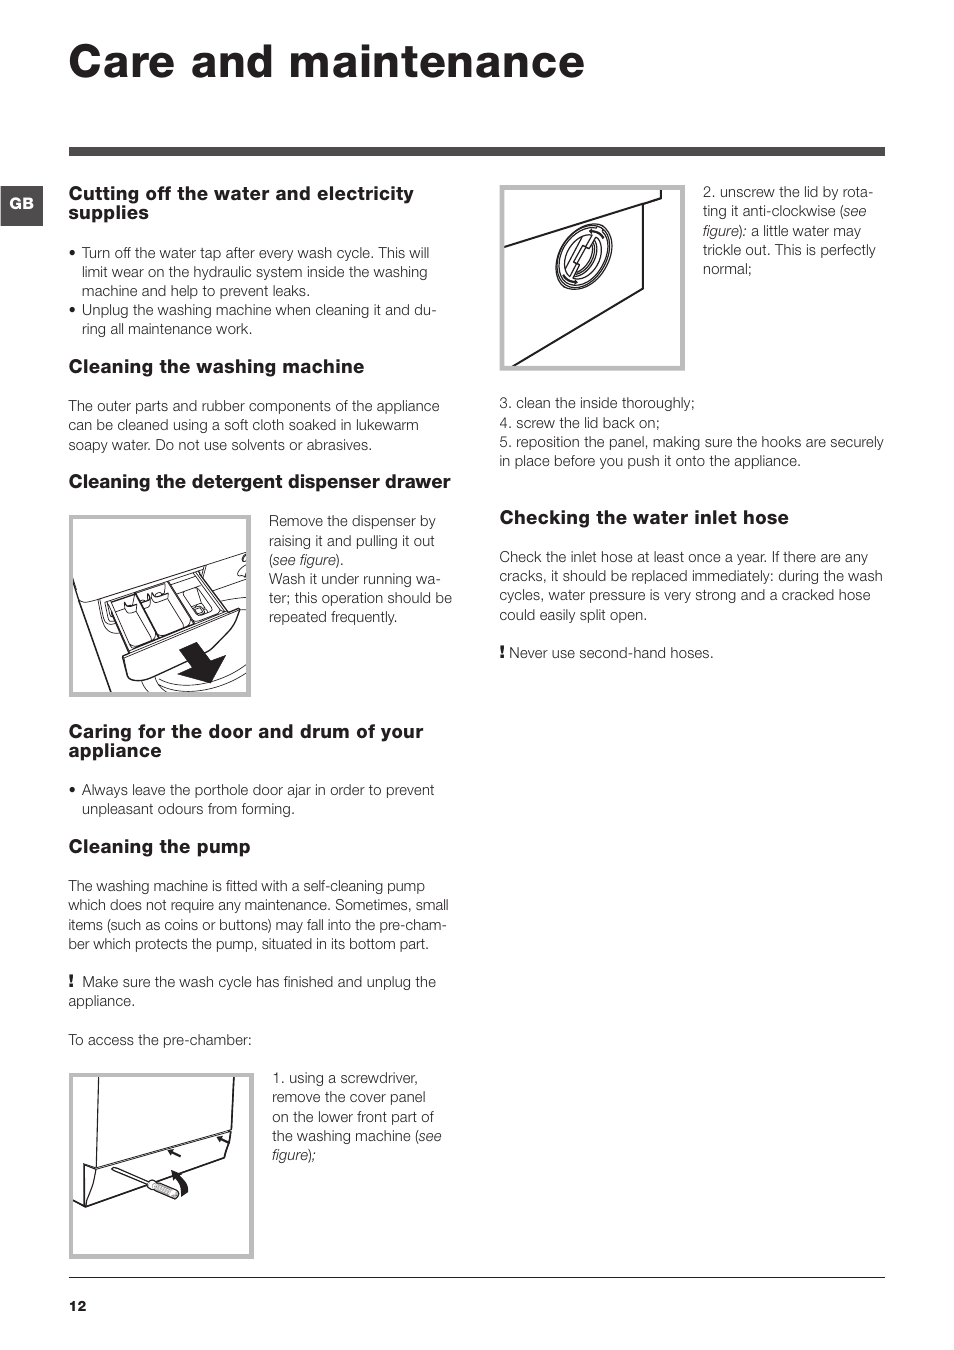 Indesit wdg1095w instruction manual.